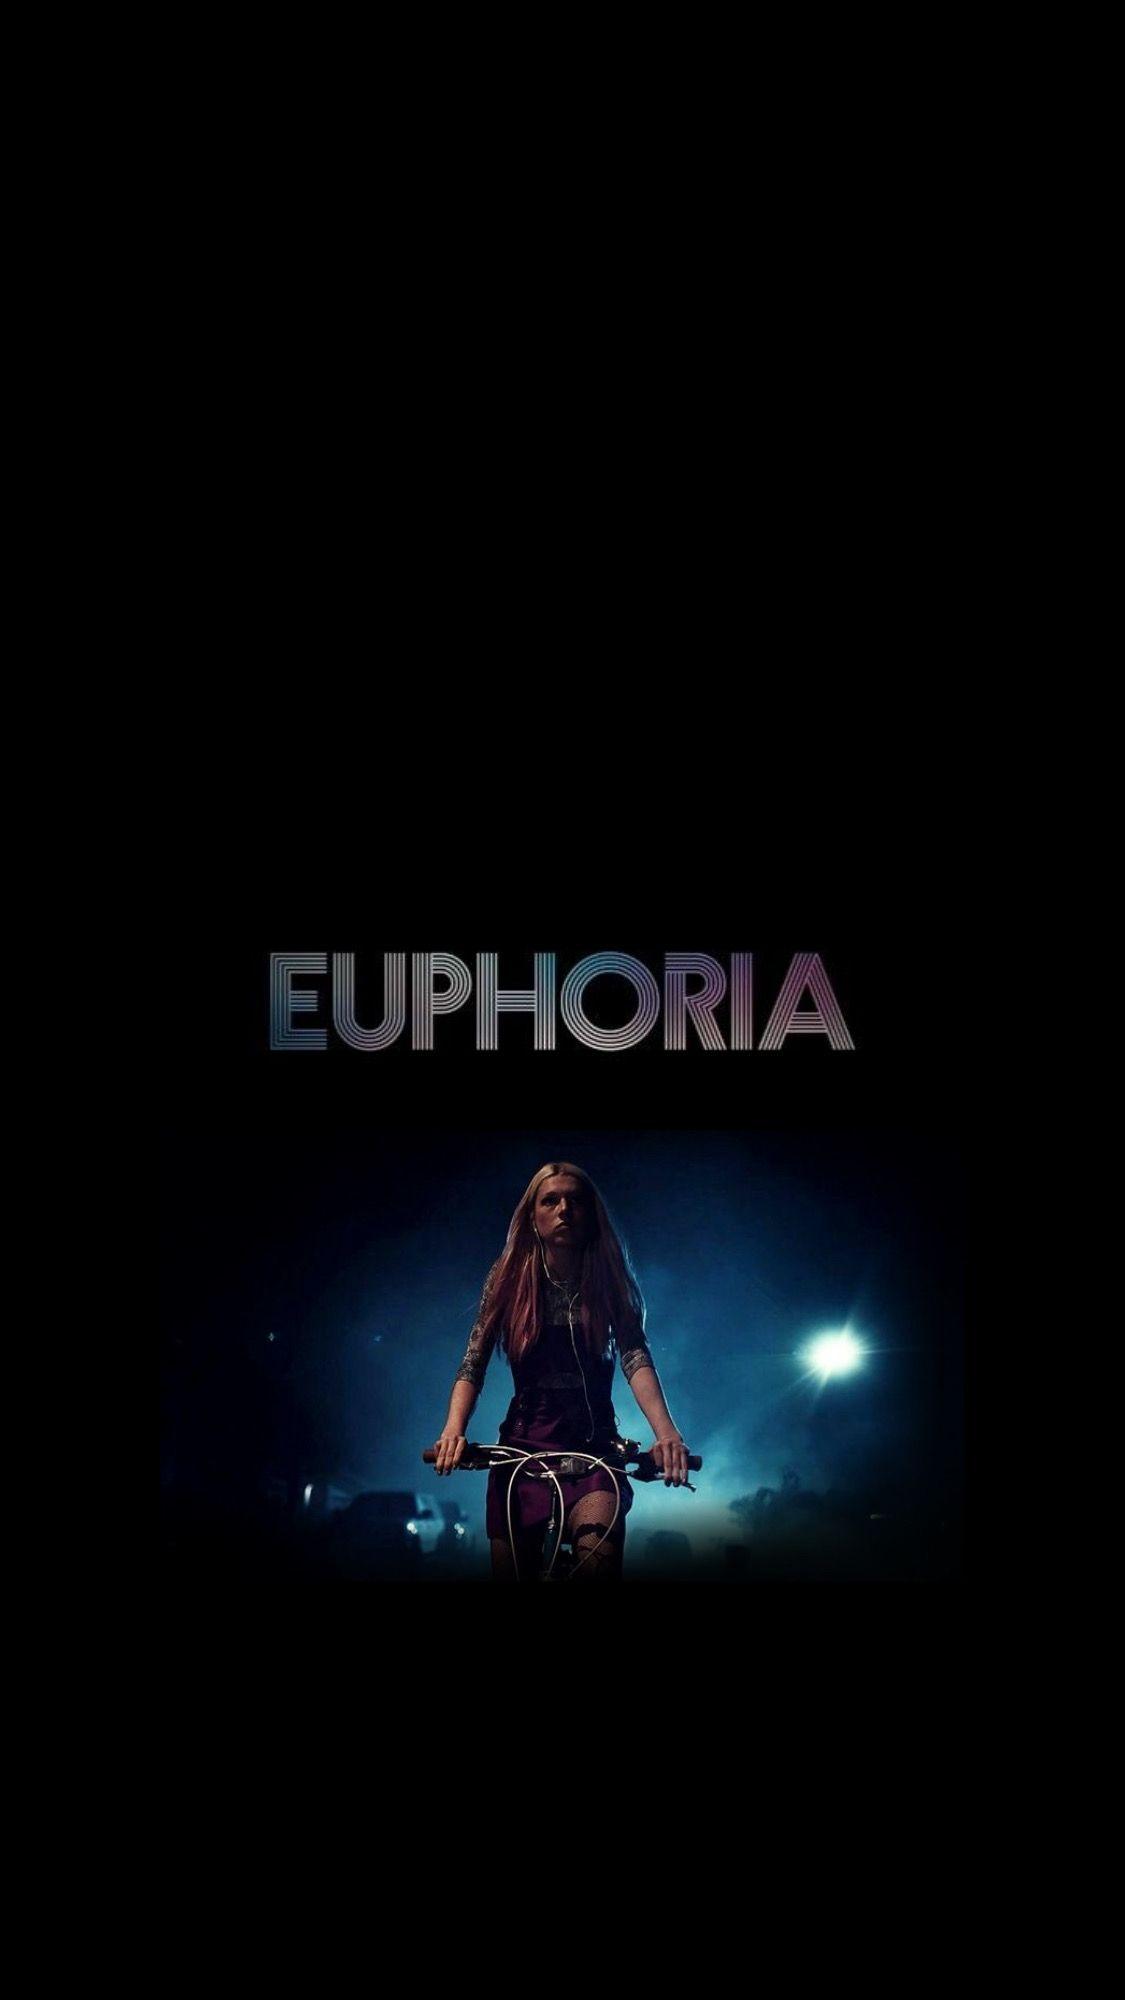 Pin On Euphoria